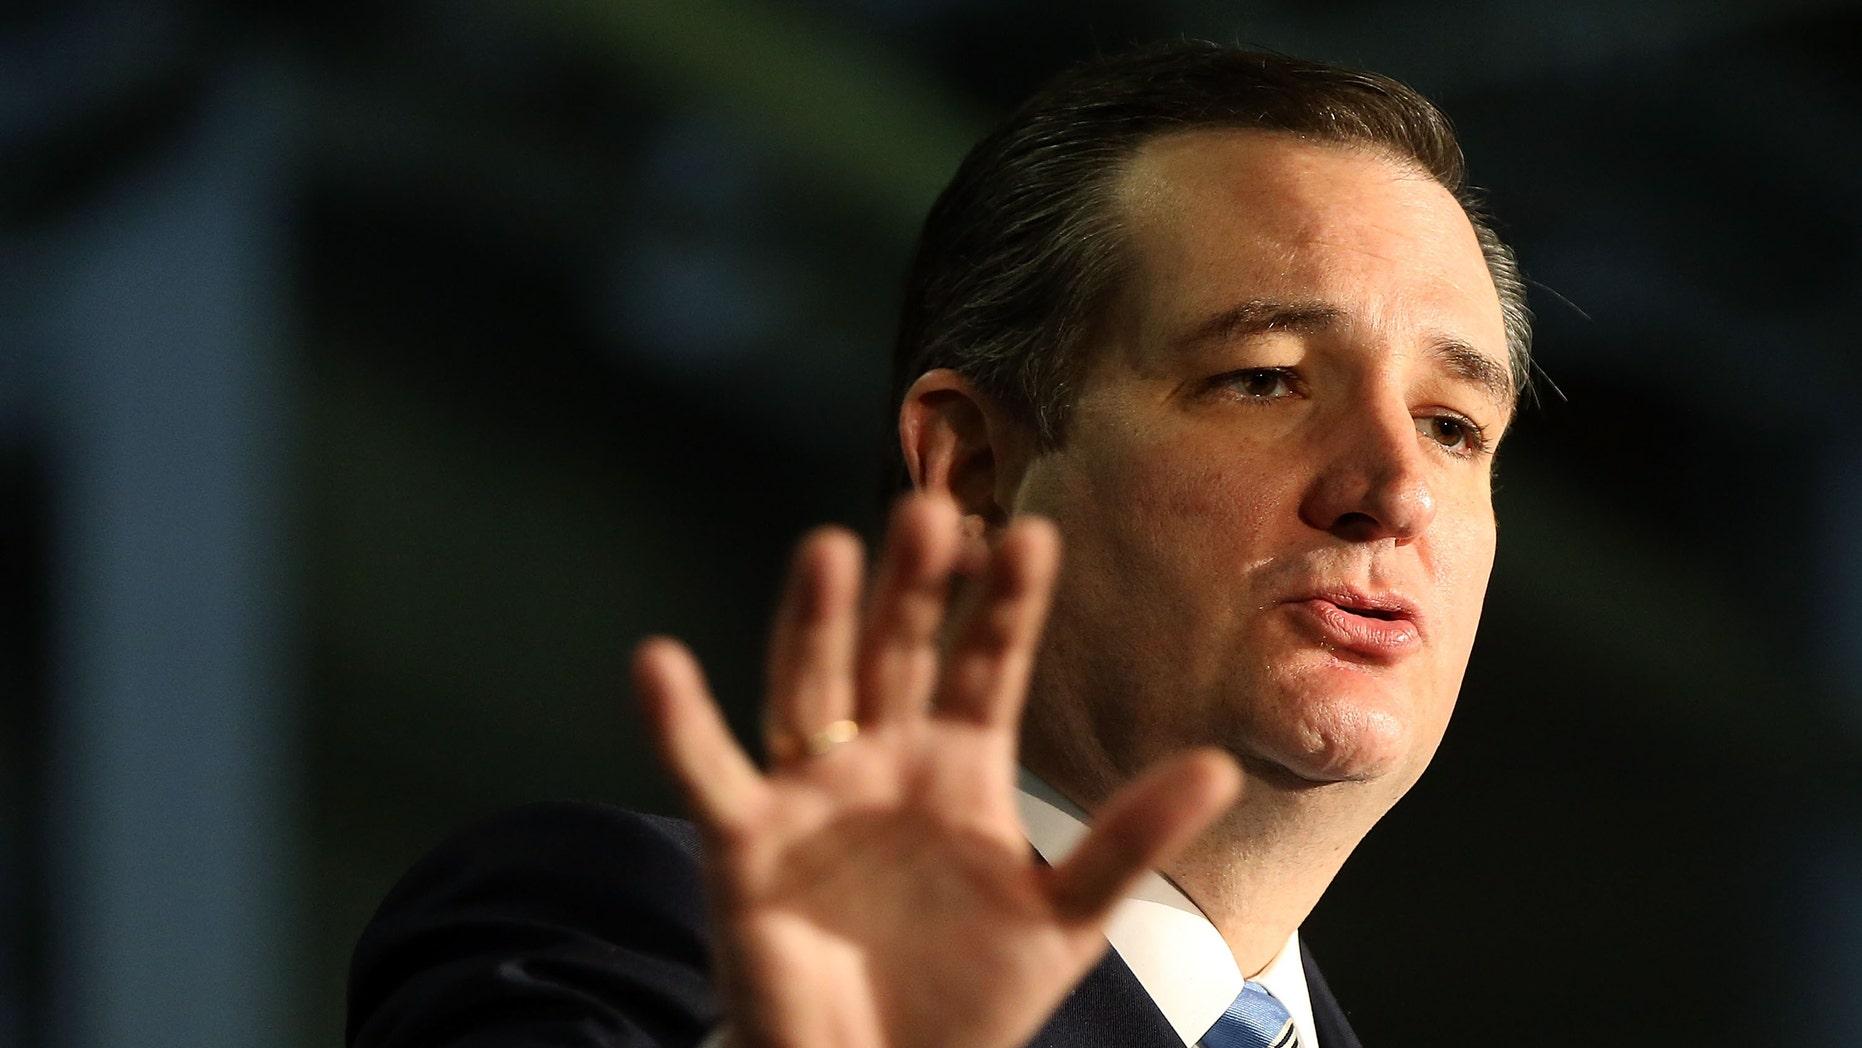 Republican presidential candidate Ted Cruz.